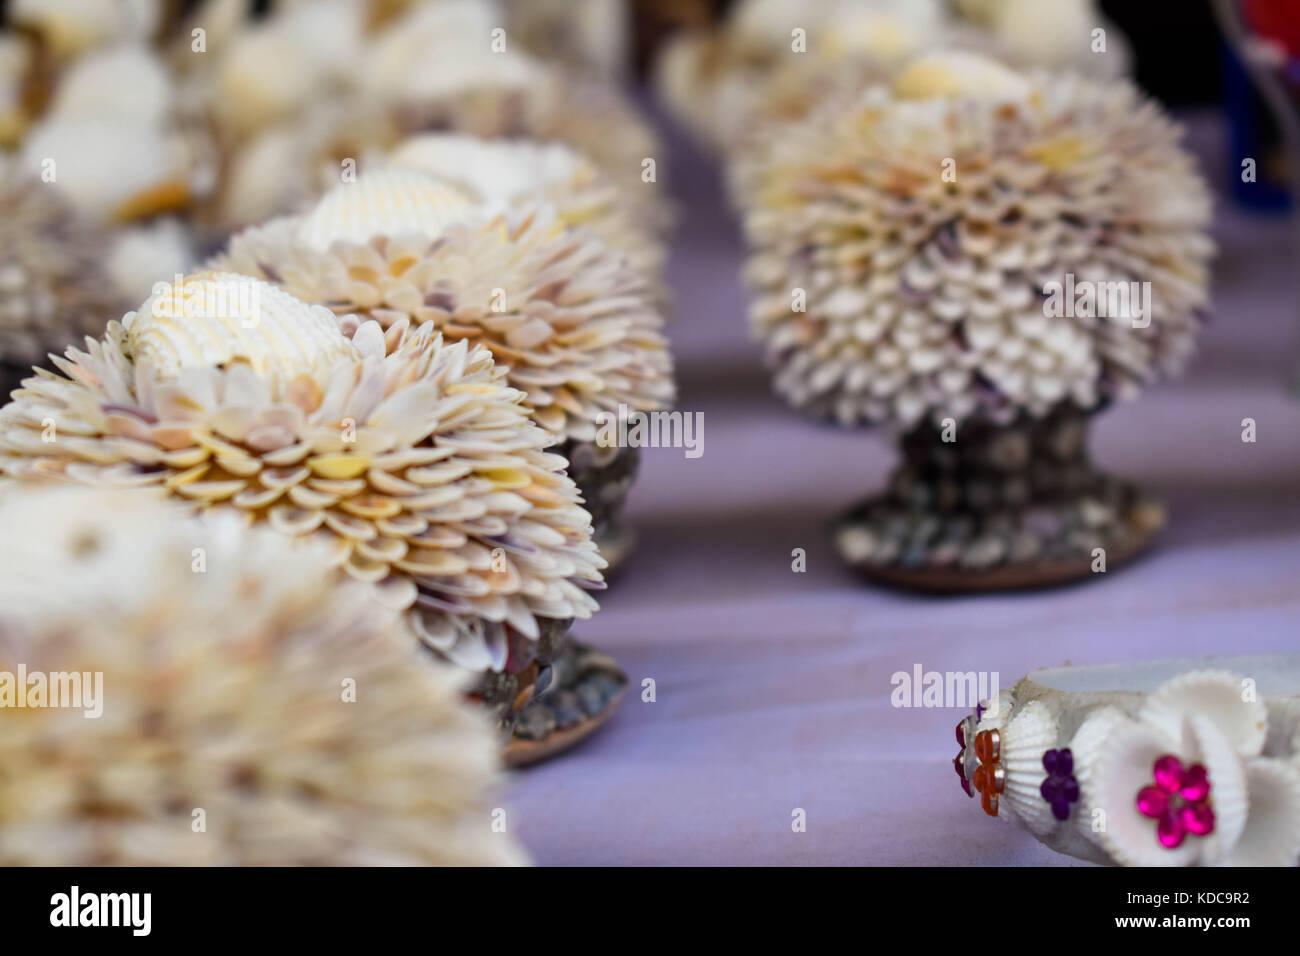 Beautiful handmade showpieces , Great background Image. Stock Photo